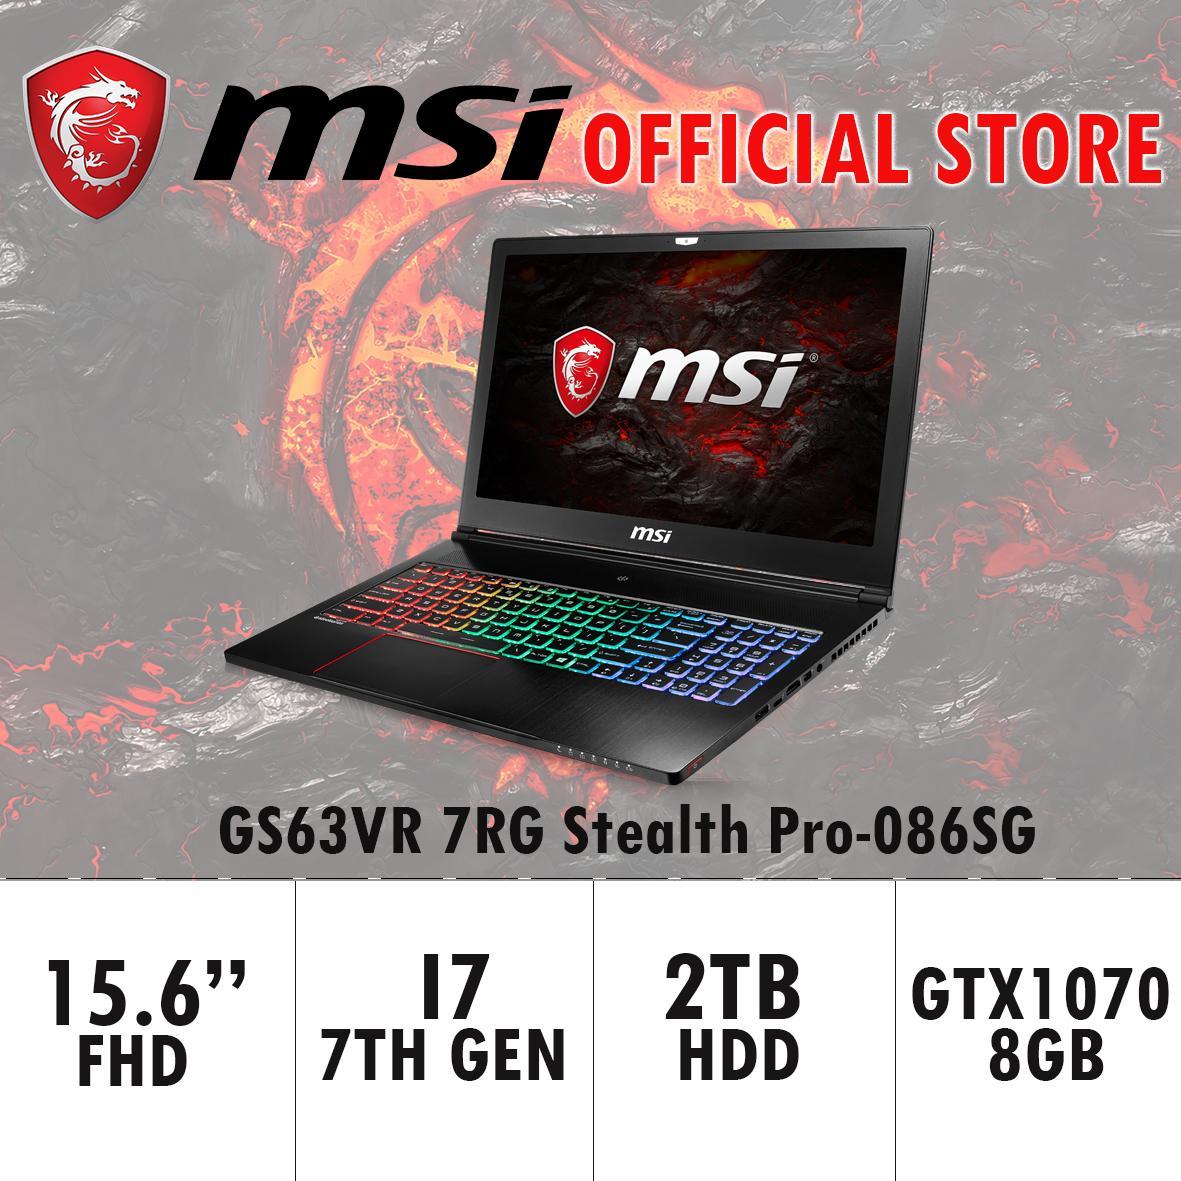 MSI GS63VR 7RG Stealth Pro-086SG (I7-7700HQ/16GB DDR4/256GB SSD +2TB HDD/8GB NVIDIA GTX1070 GDDR5 MAX-Q) GAMING LAPTOP